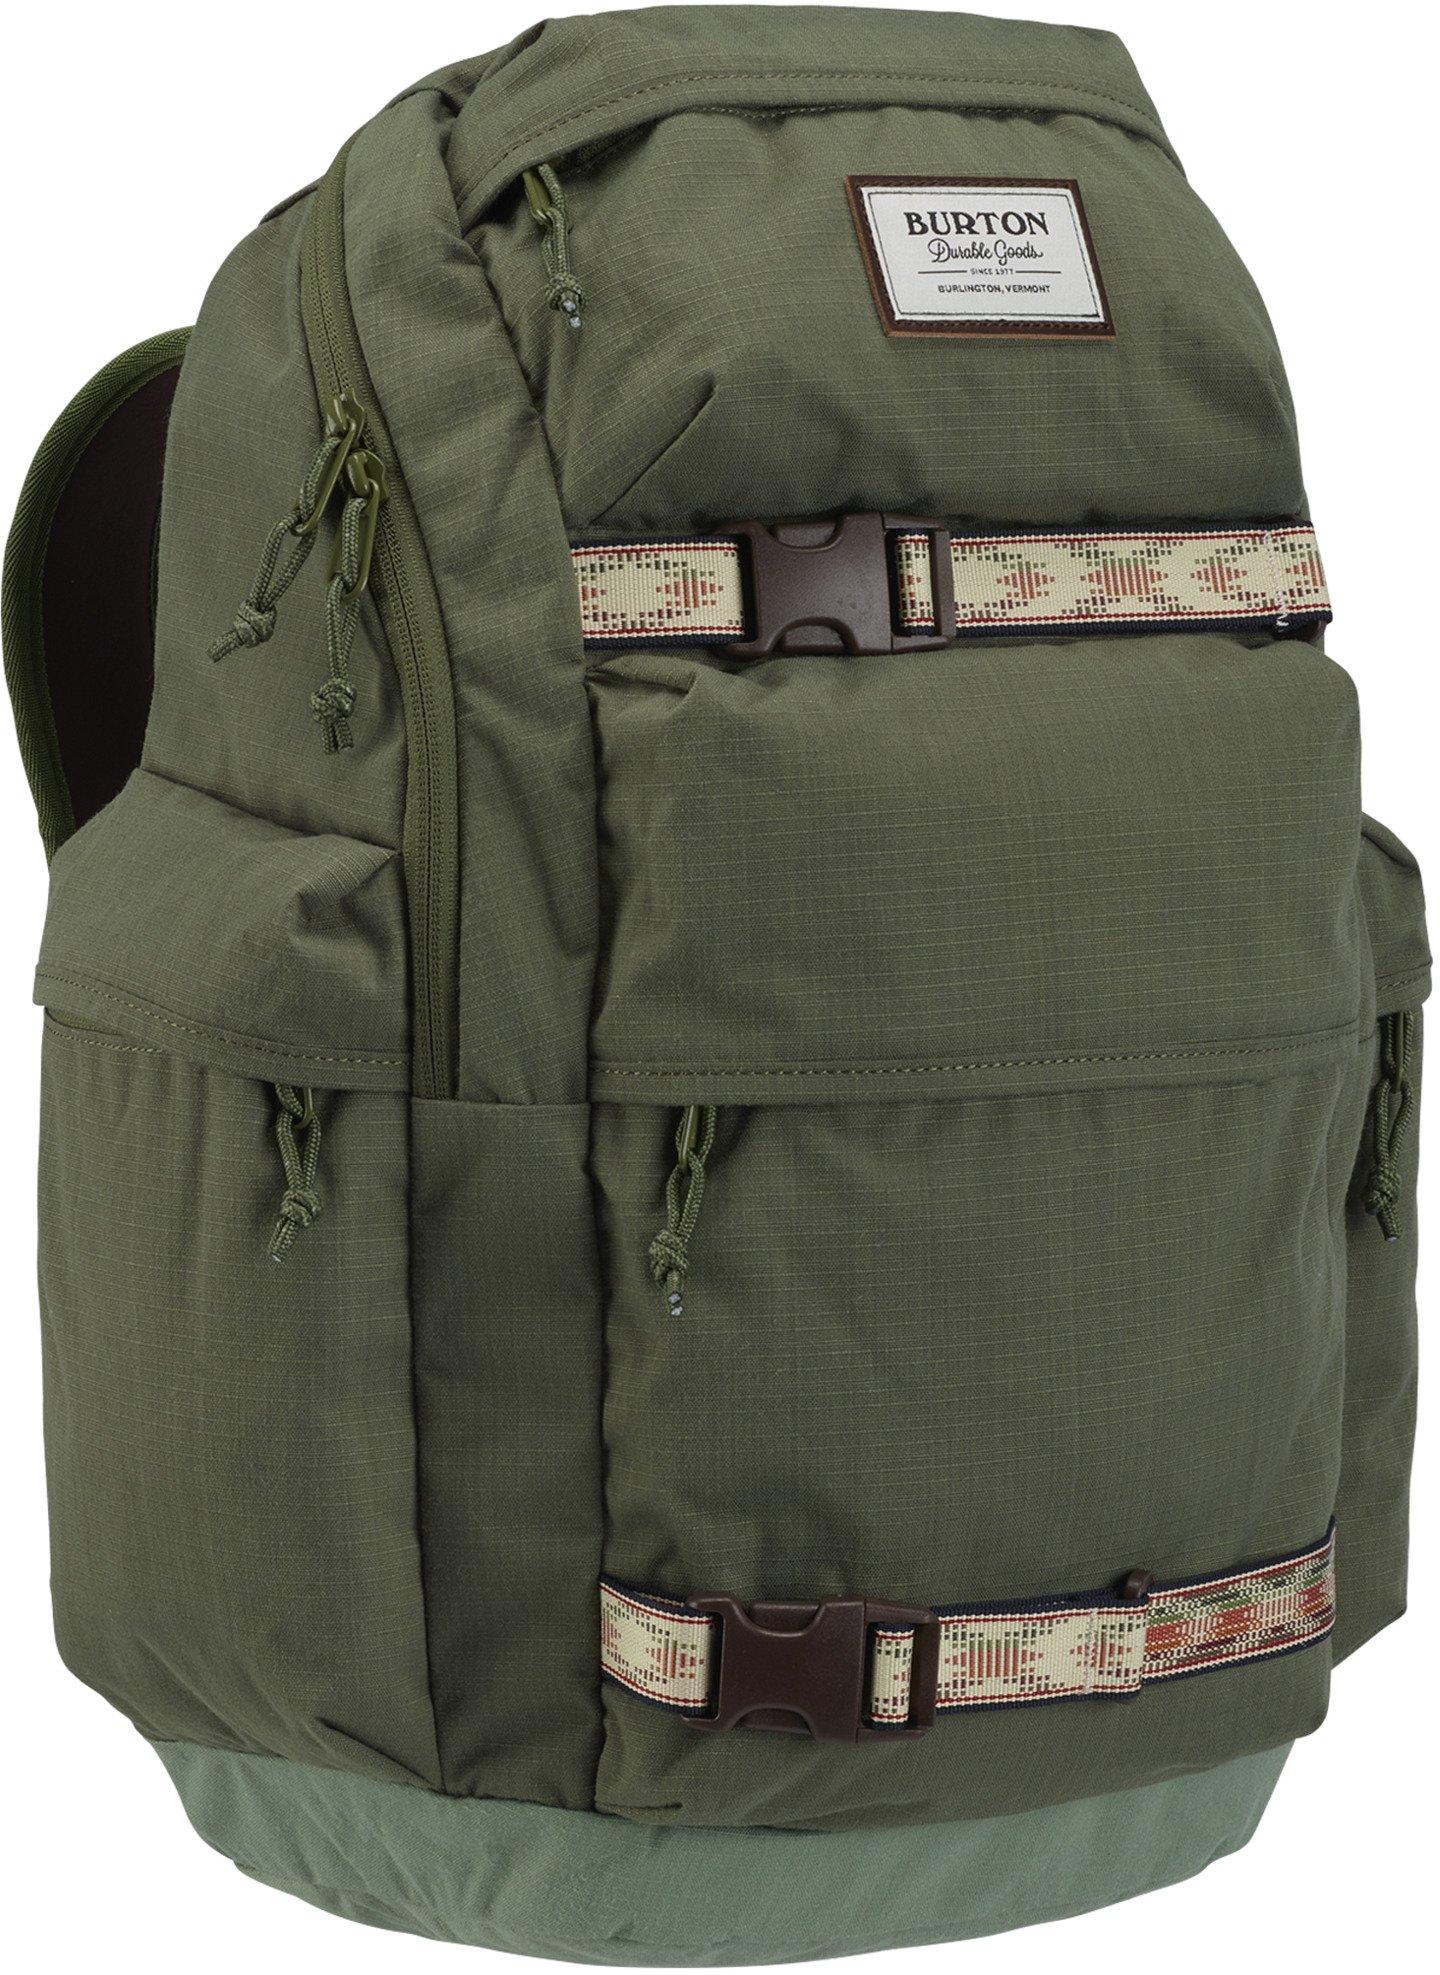 Burton Kilo backpack, Clover Ripstop, One Size